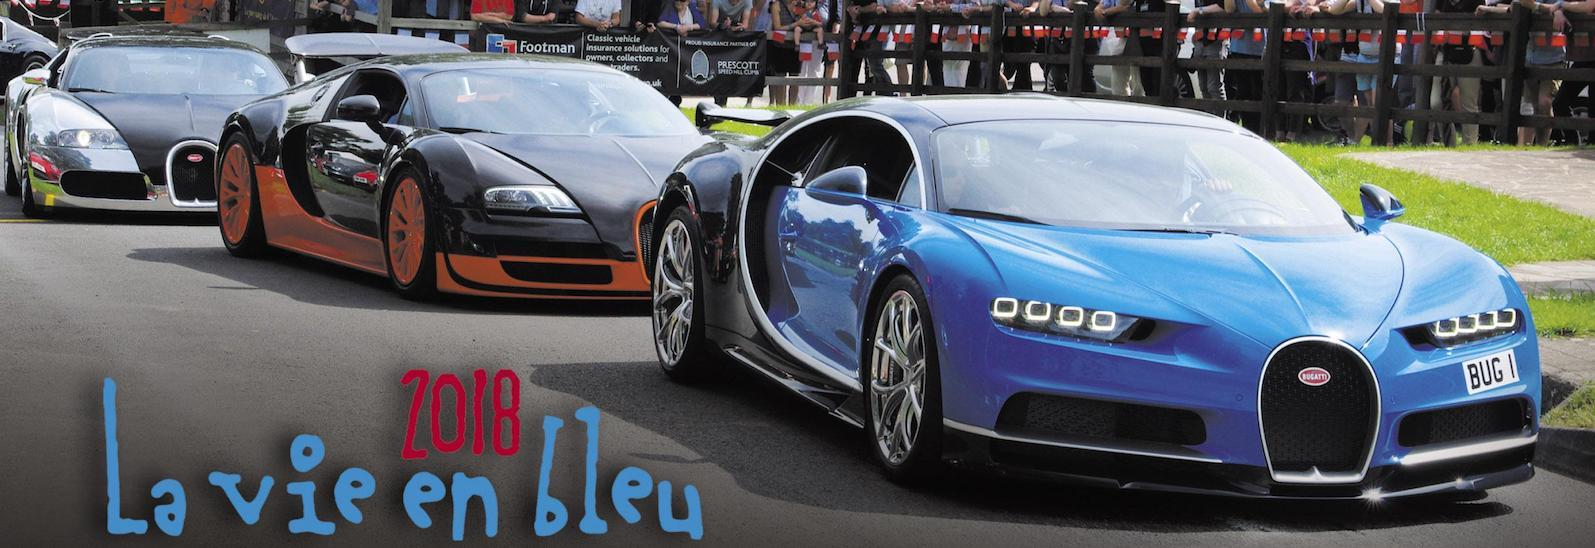 Bugatti Chiron to take on Prescott Hill Climb